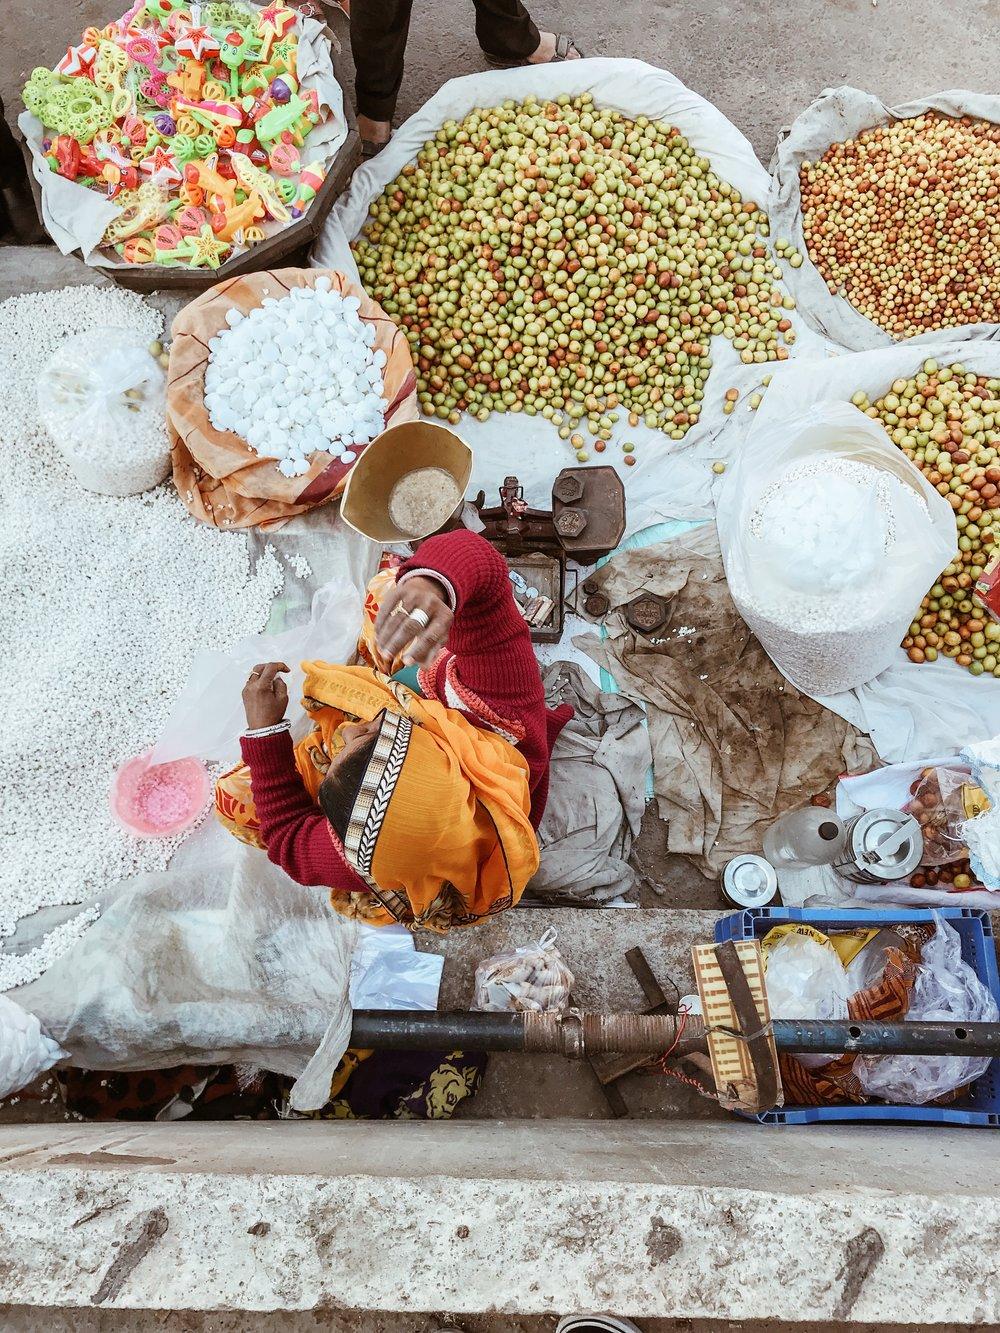 Lady selling Grain, Johari Bazaar